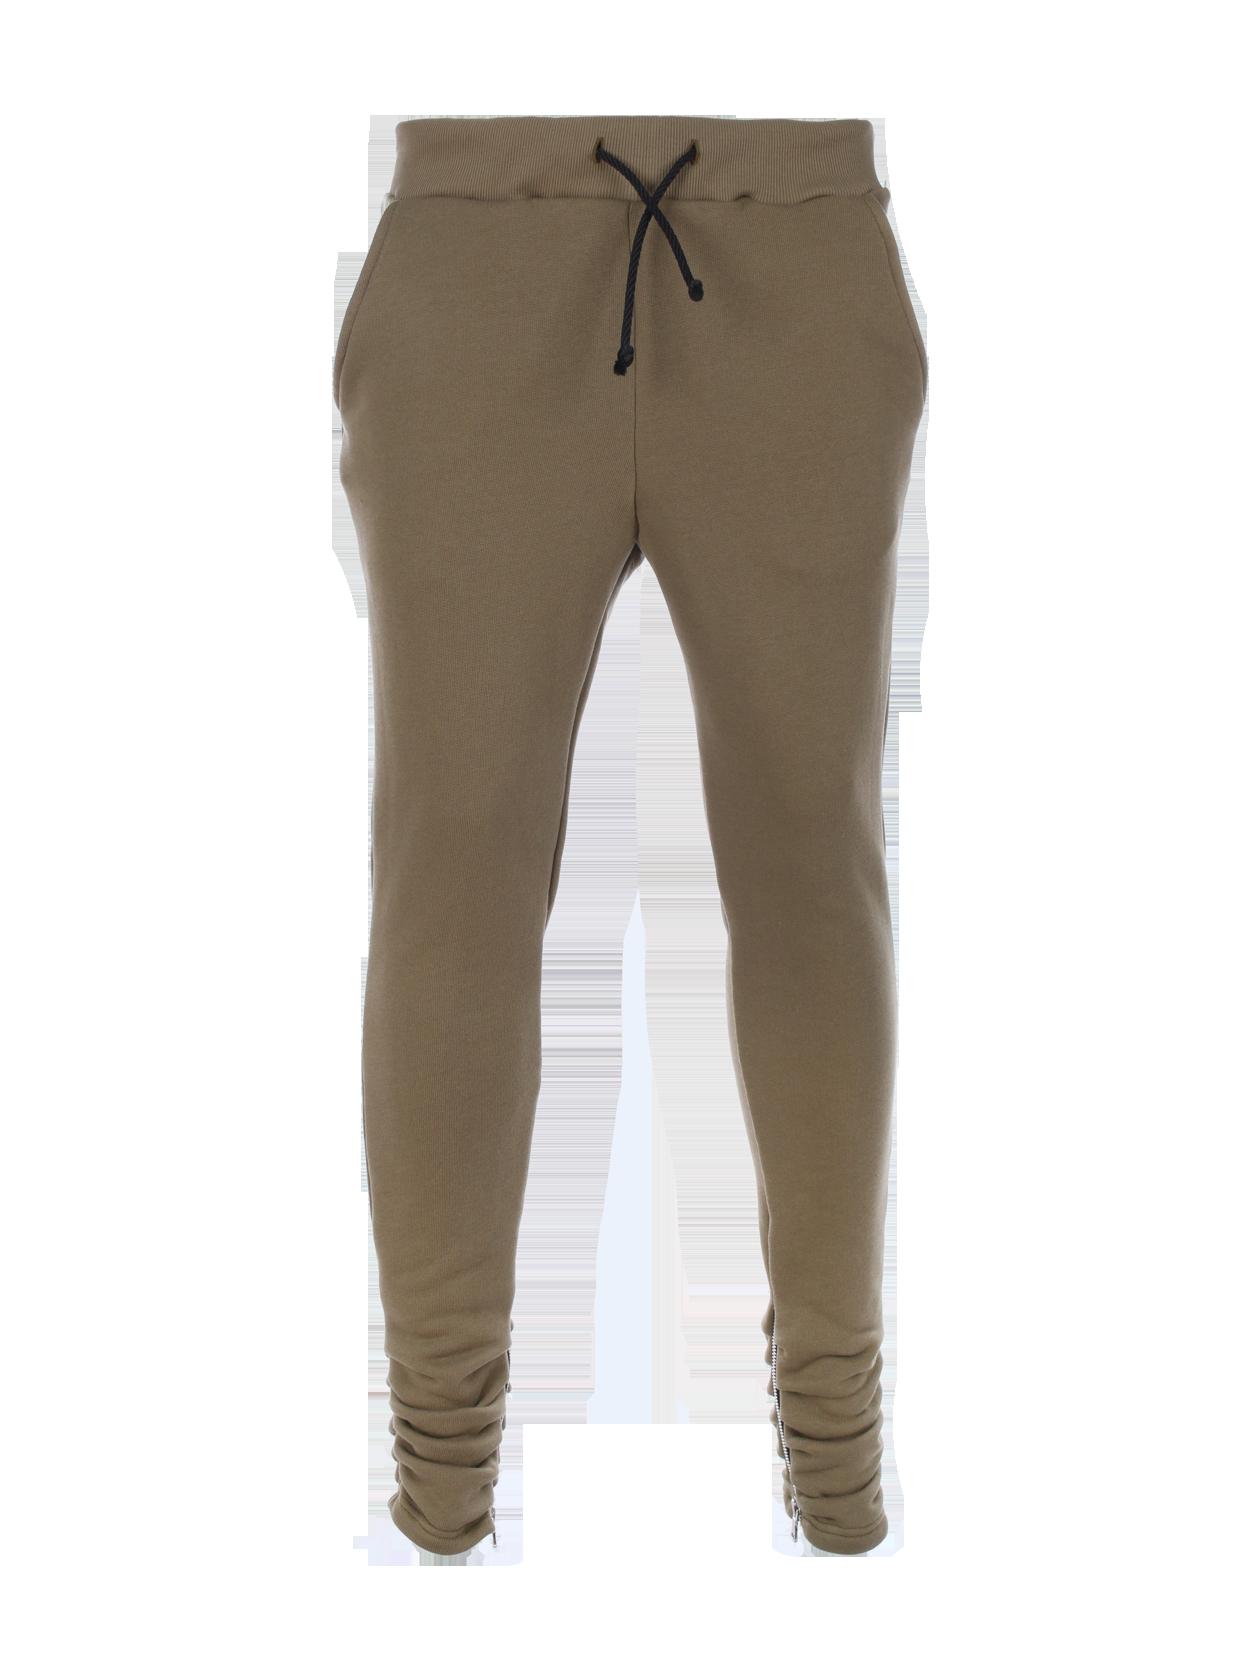 Unisex Pants Black Star Zip